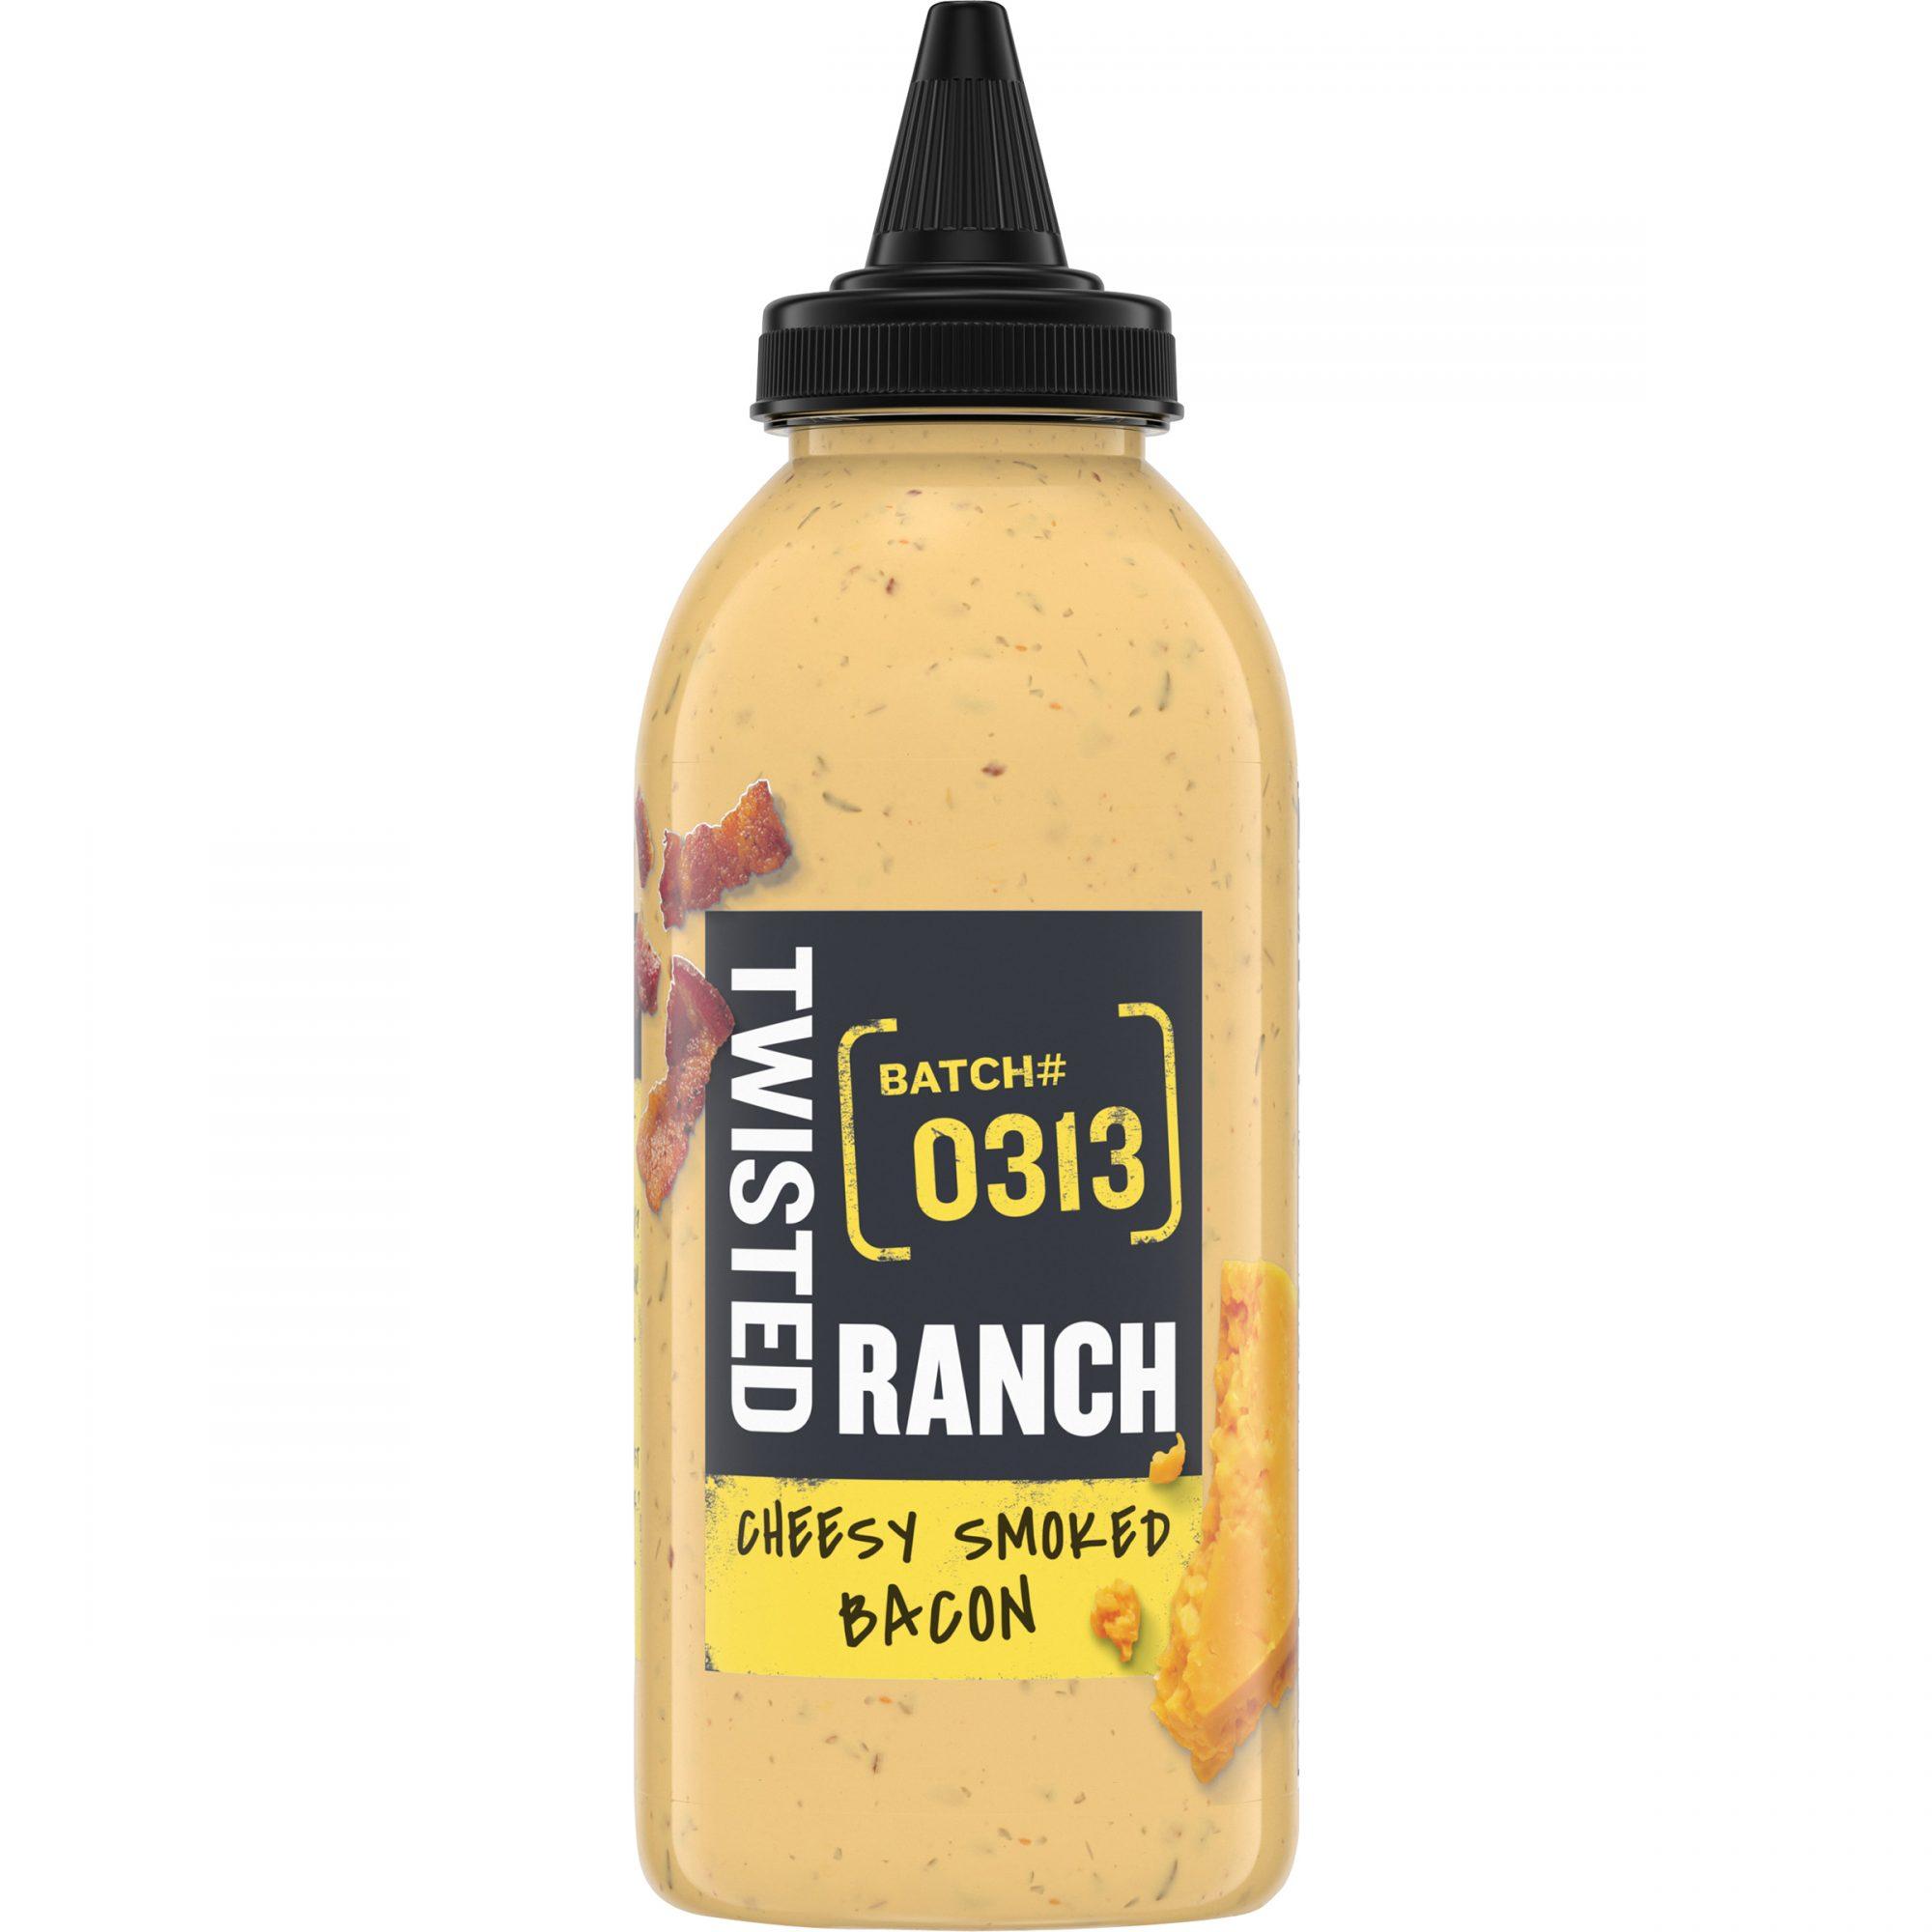 Cheesy Smoked Bacon Ranch Bottle